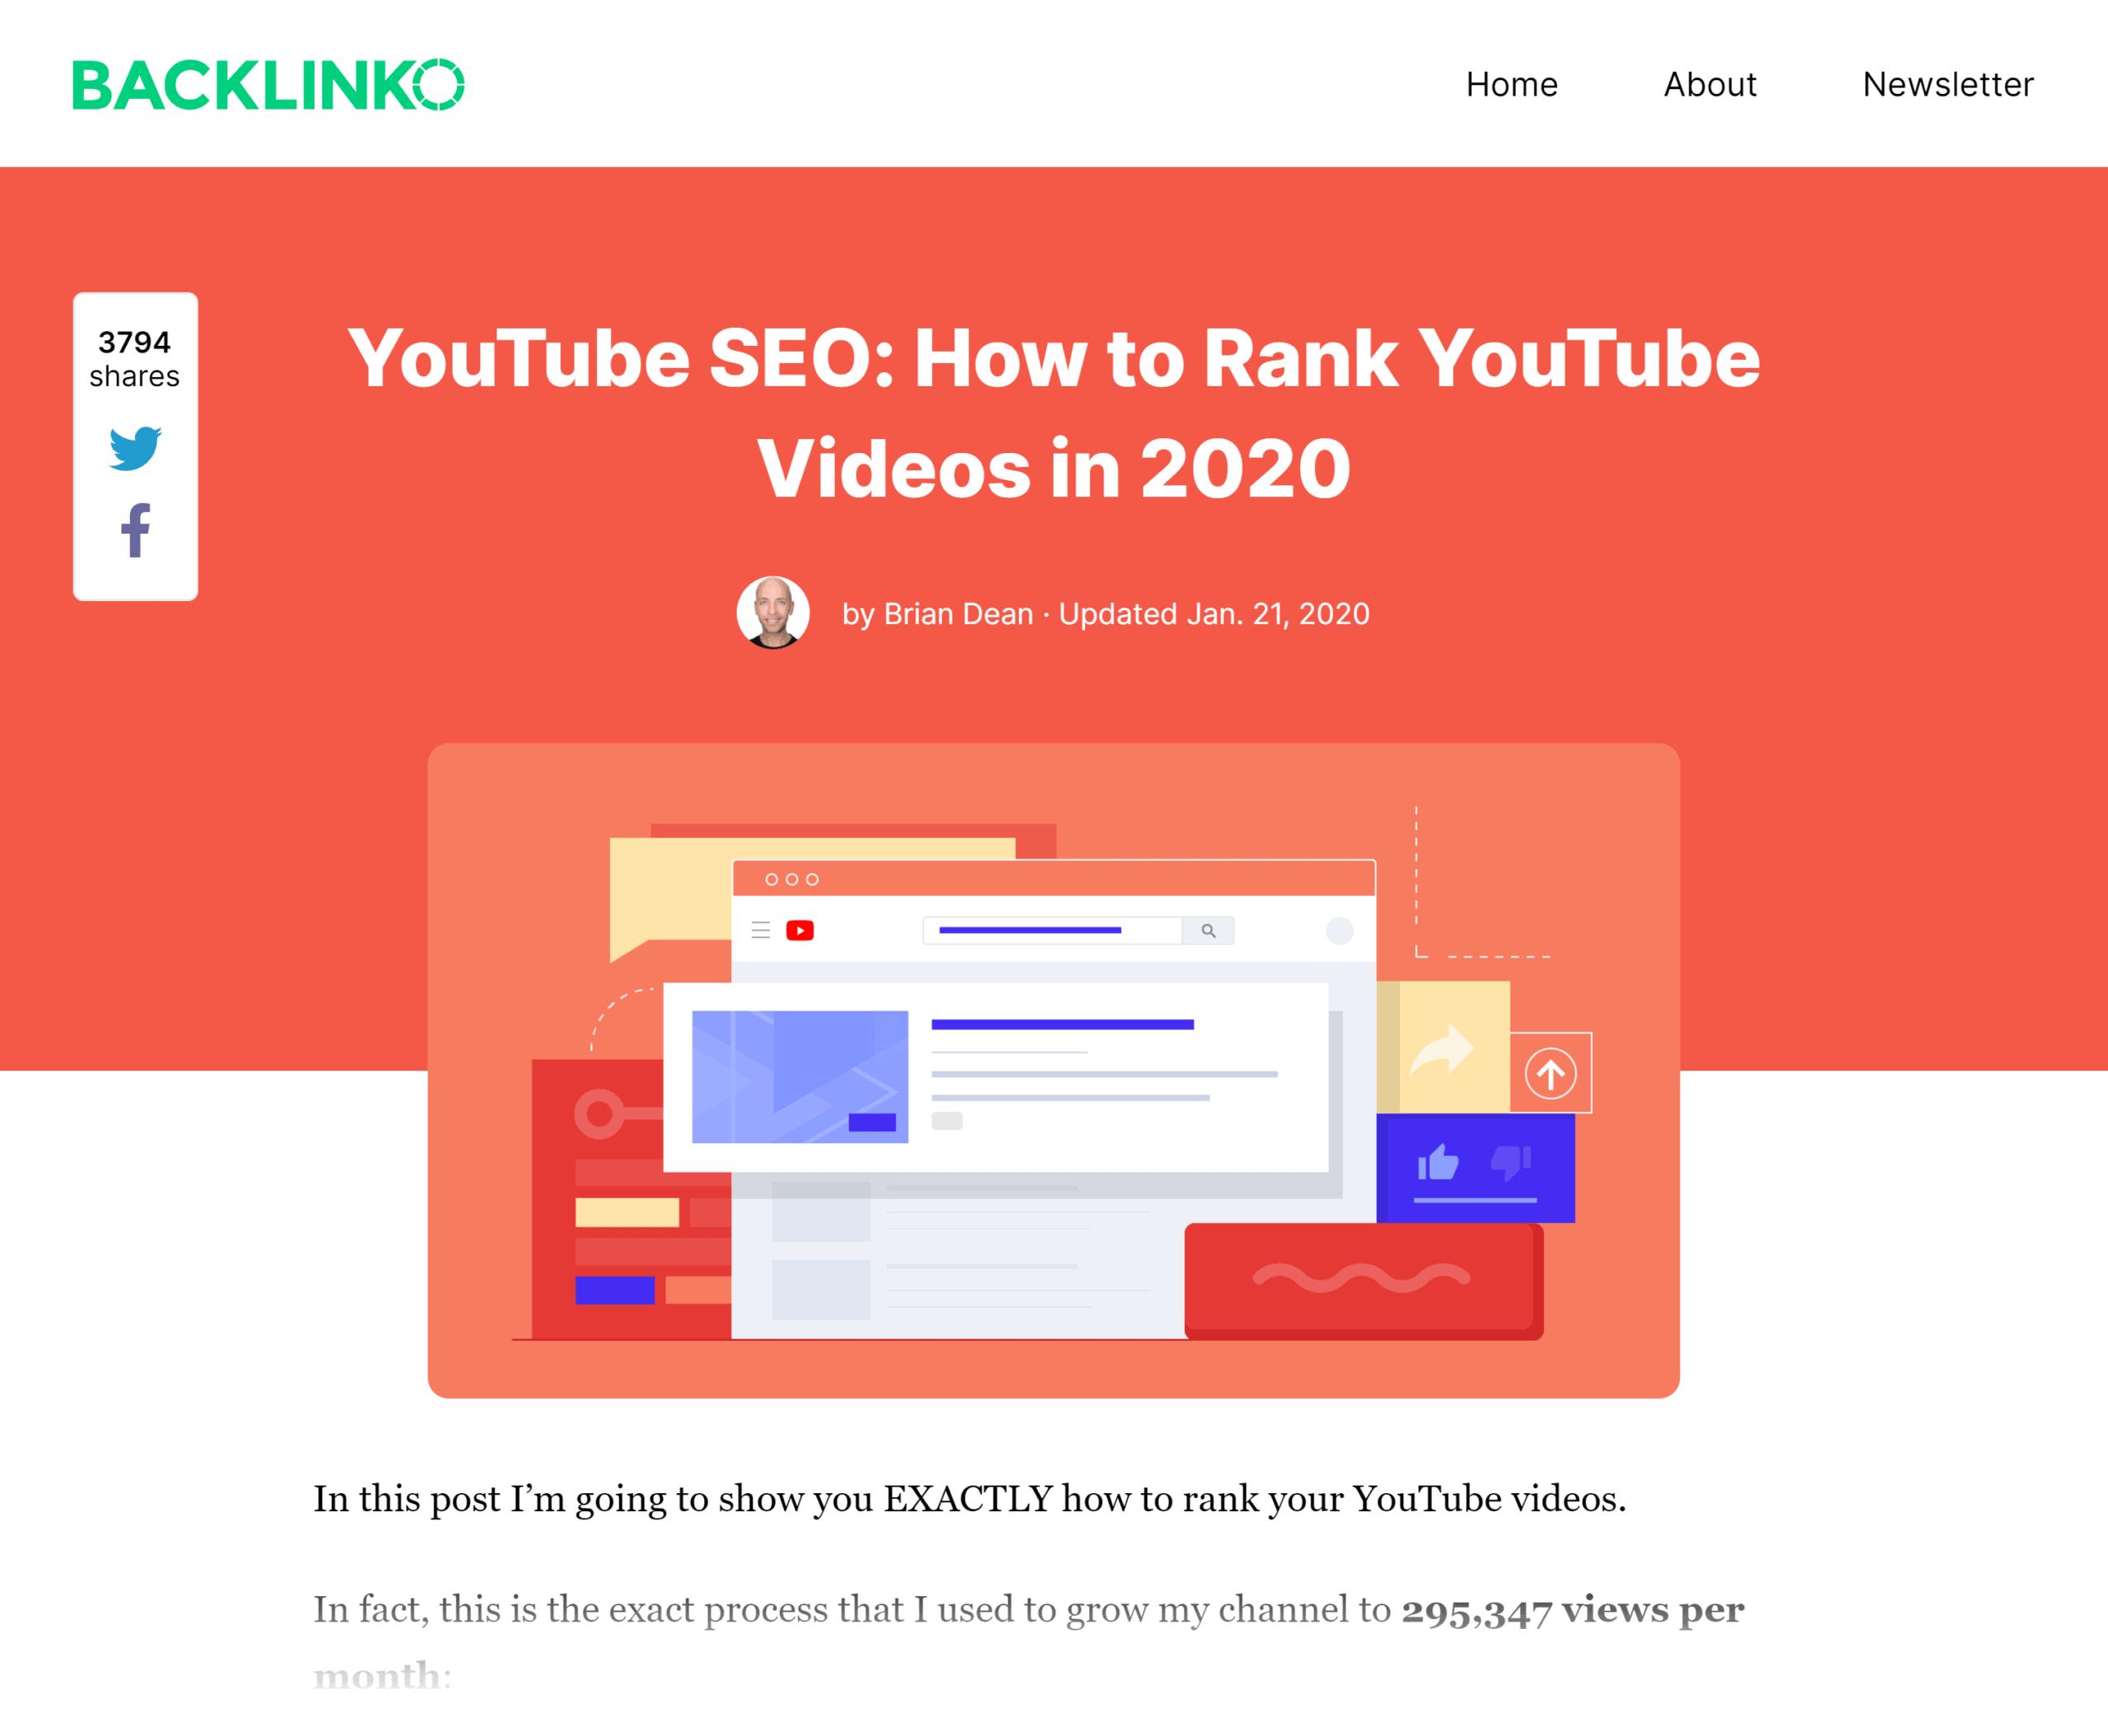 Backlinko – How to rank YouTube videos post